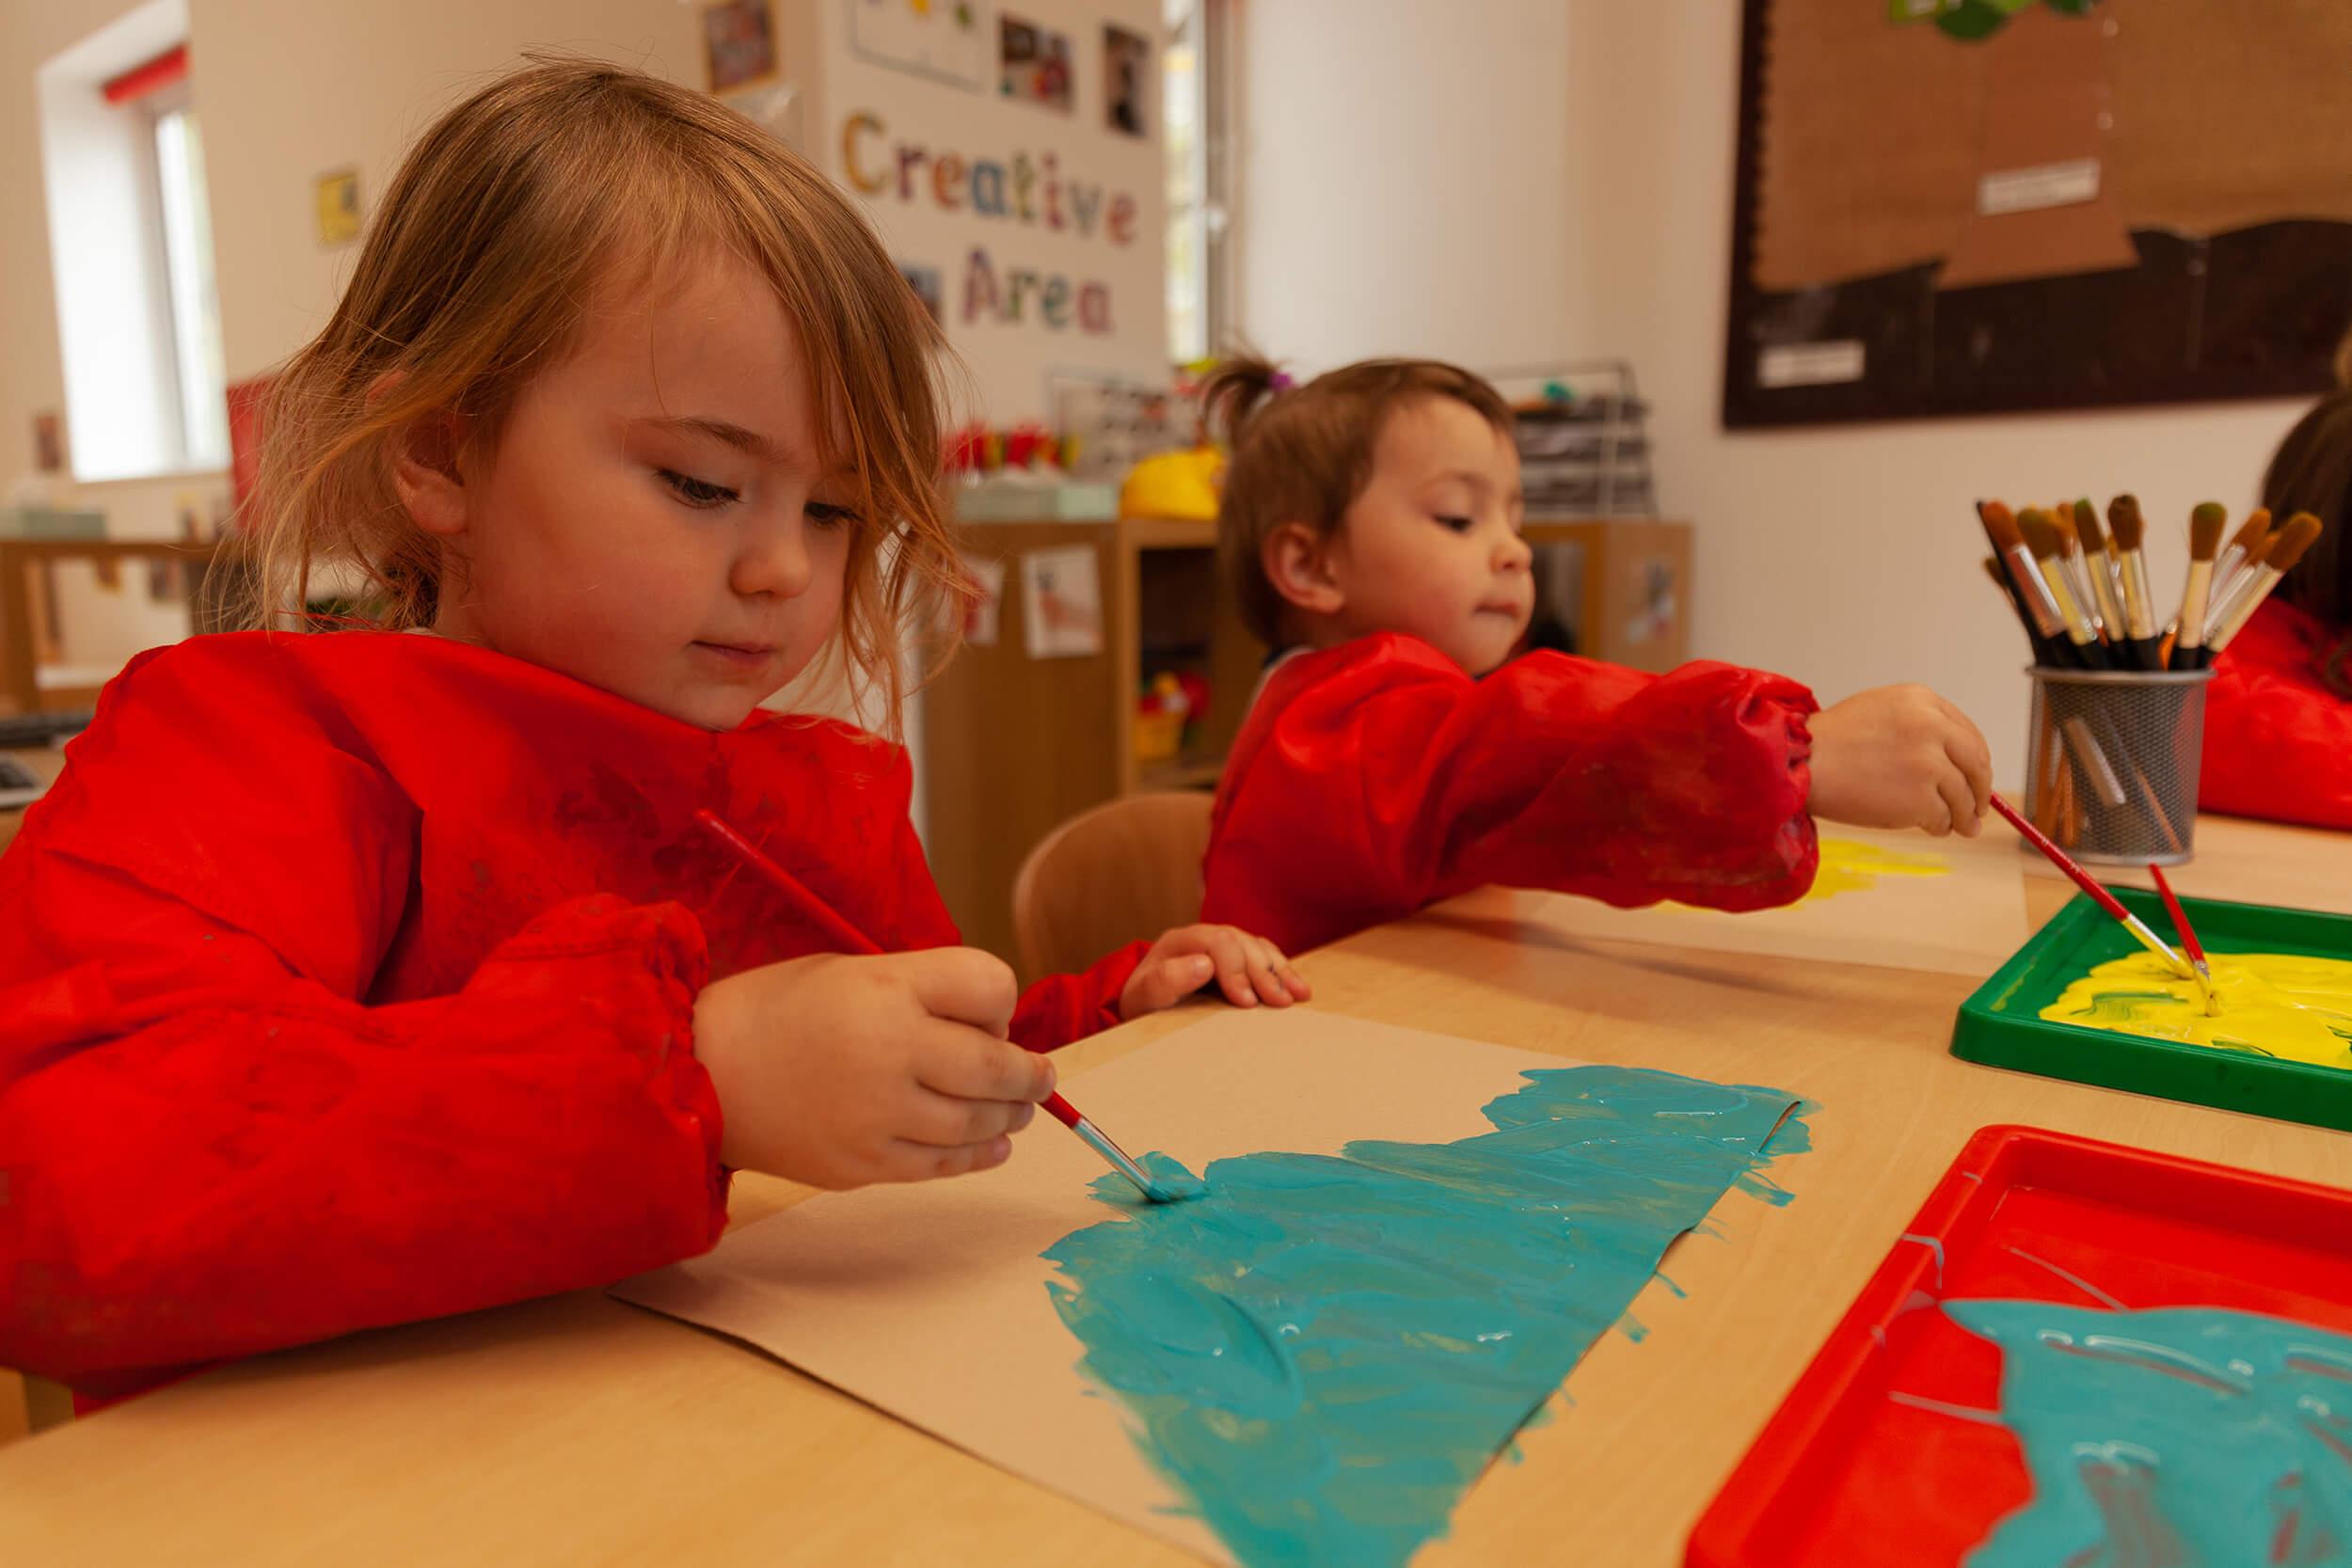 2 children painting